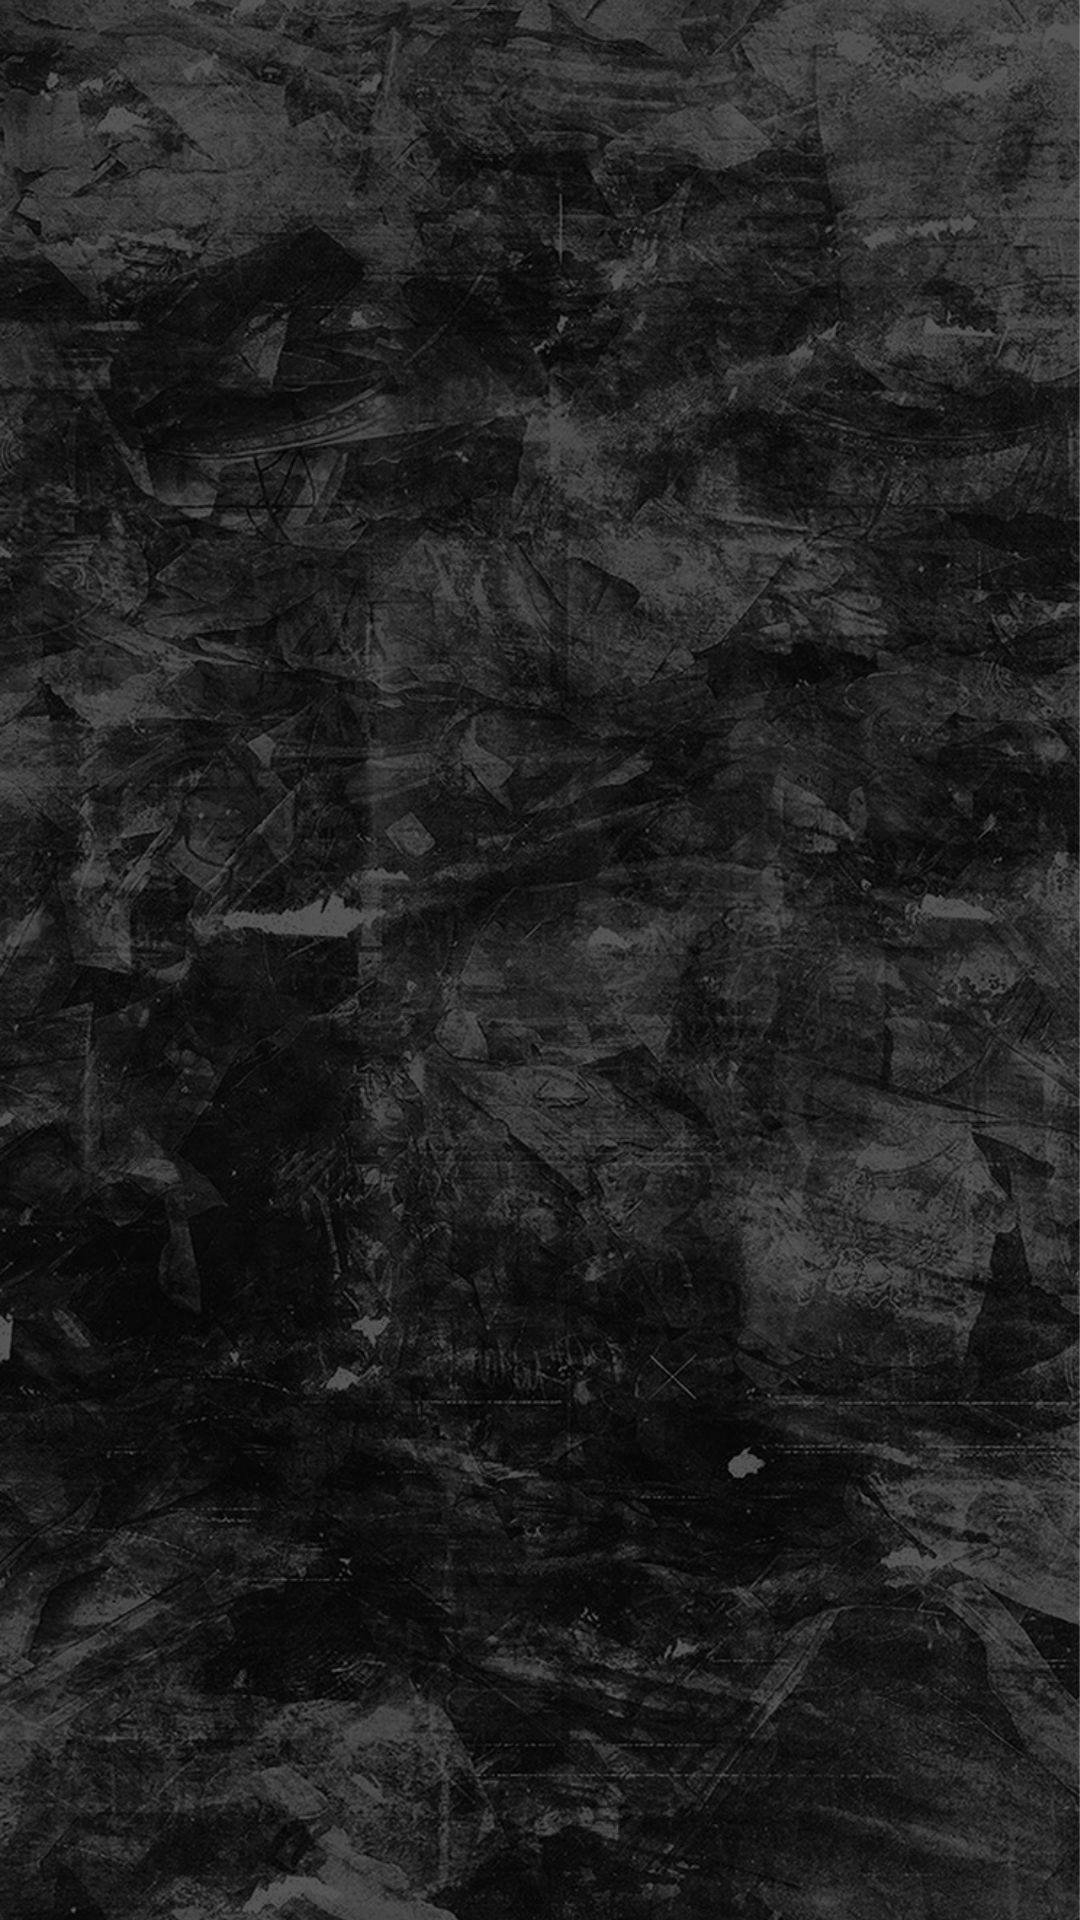 Wonder Art Illust Grunge Abstract Black iPhone 7 wallpaper 1080x1920